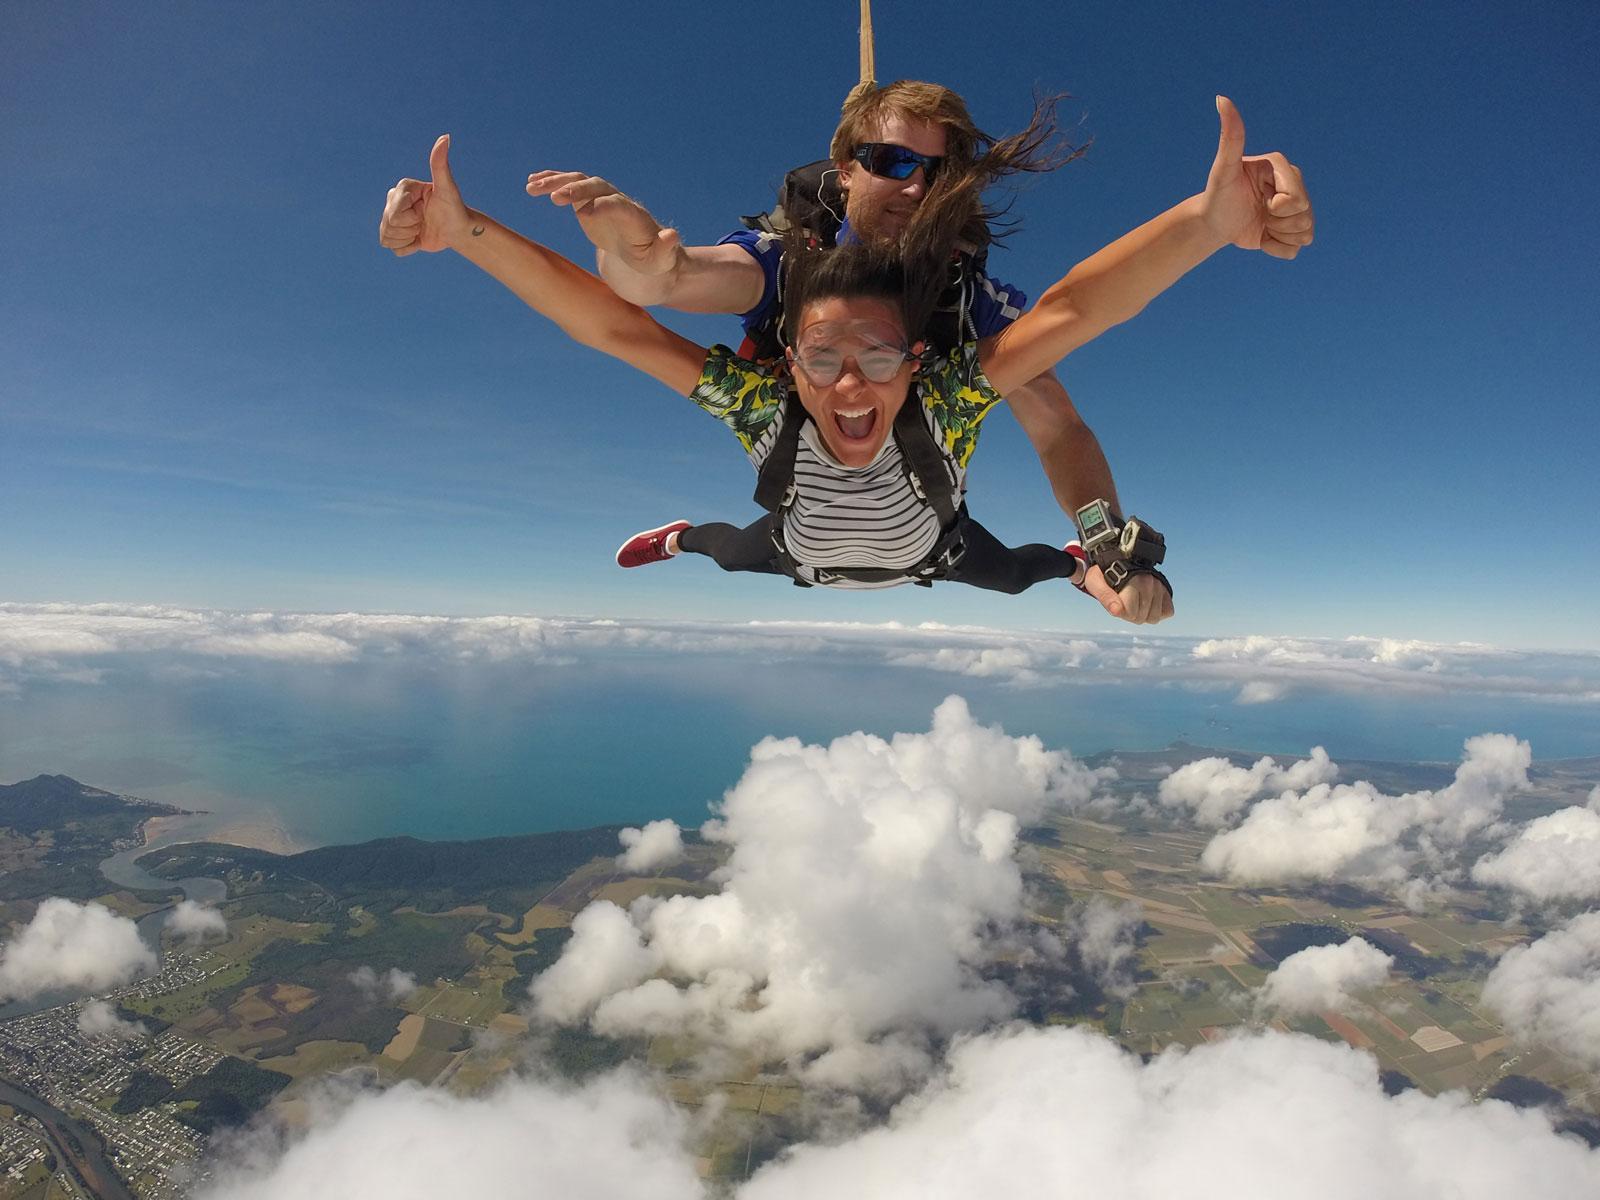 Tandem Skydive 14,000ft